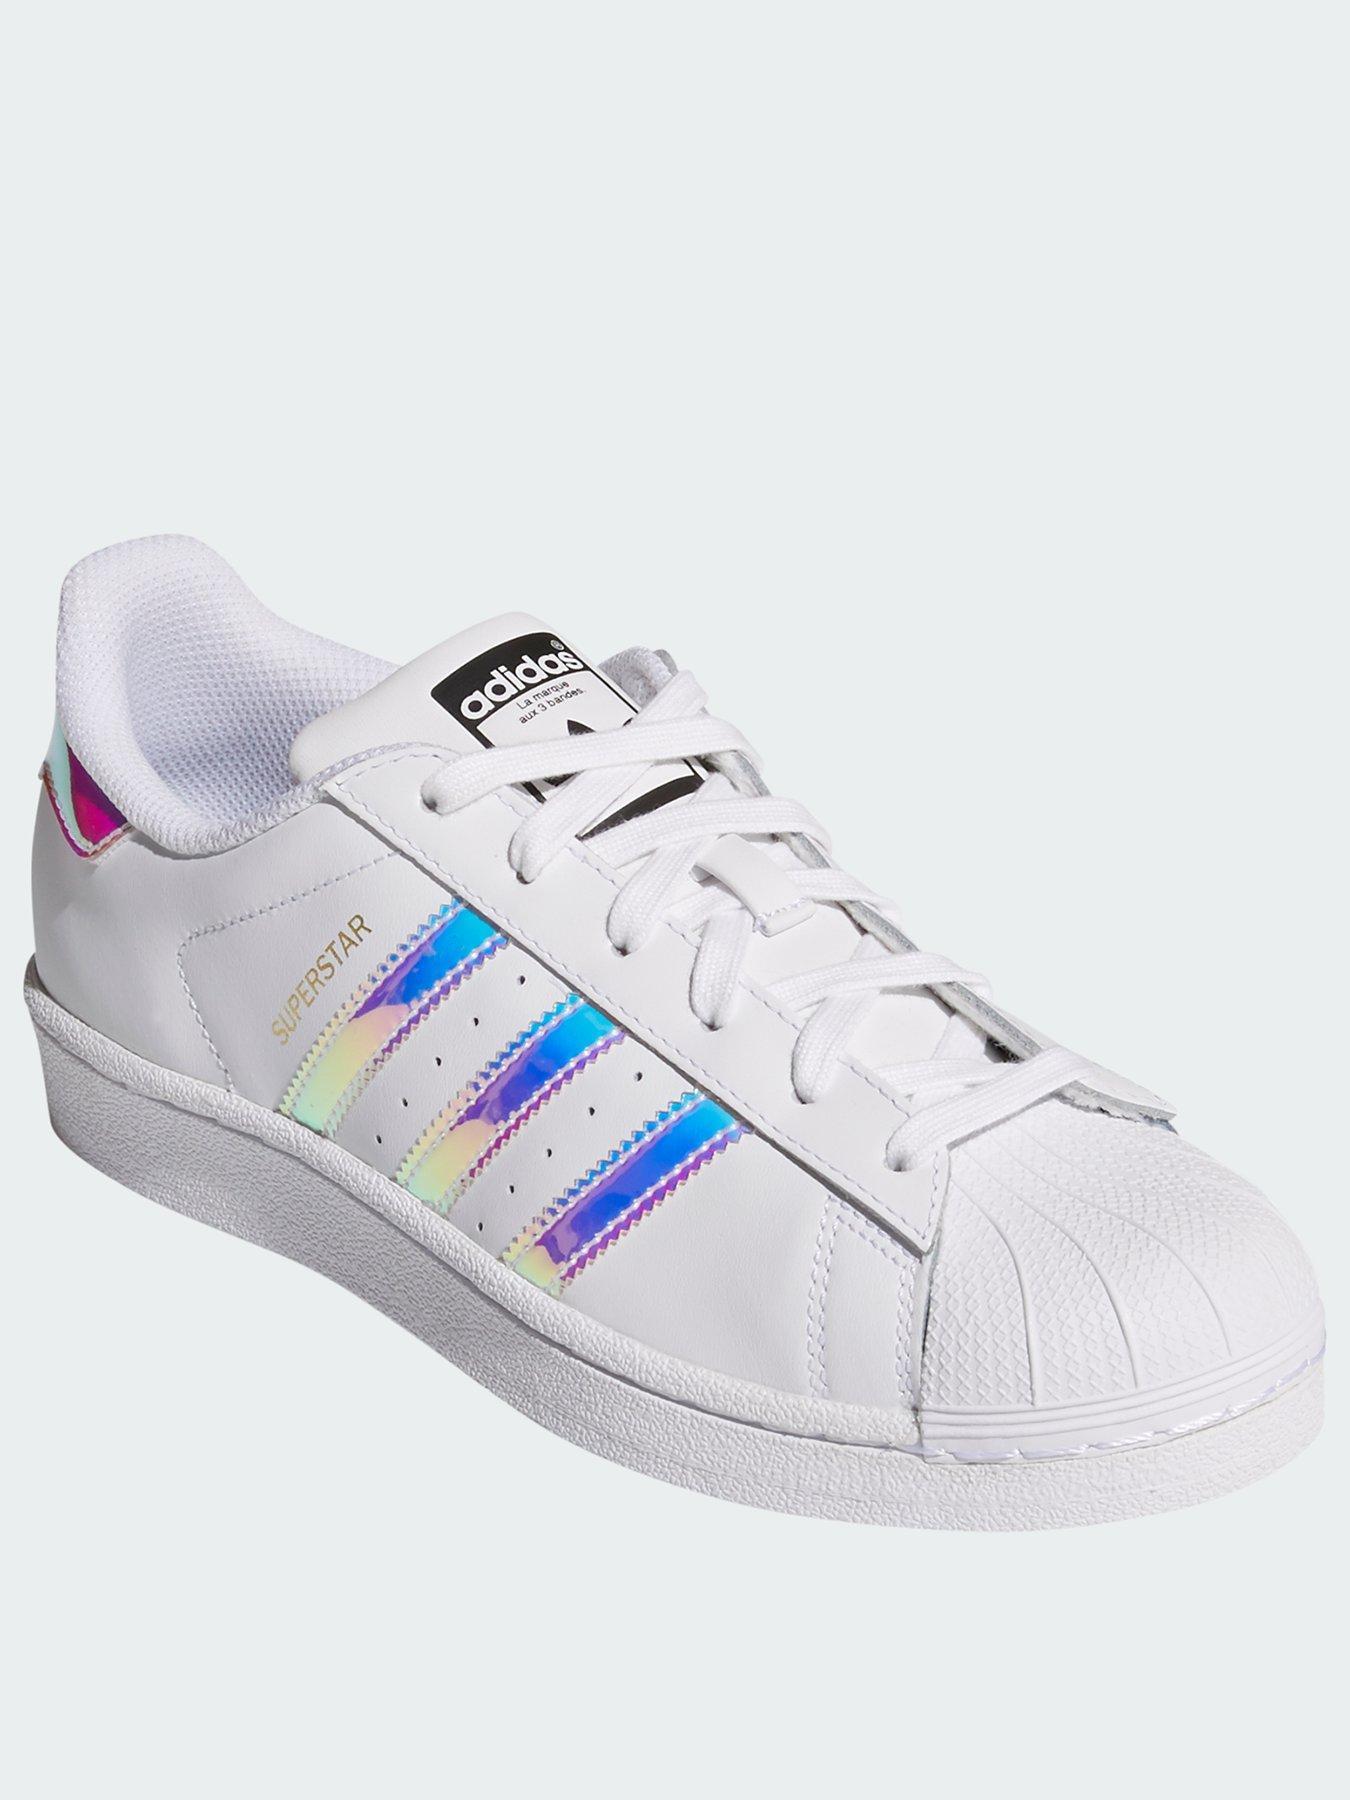 adidas size 3 trainers boys